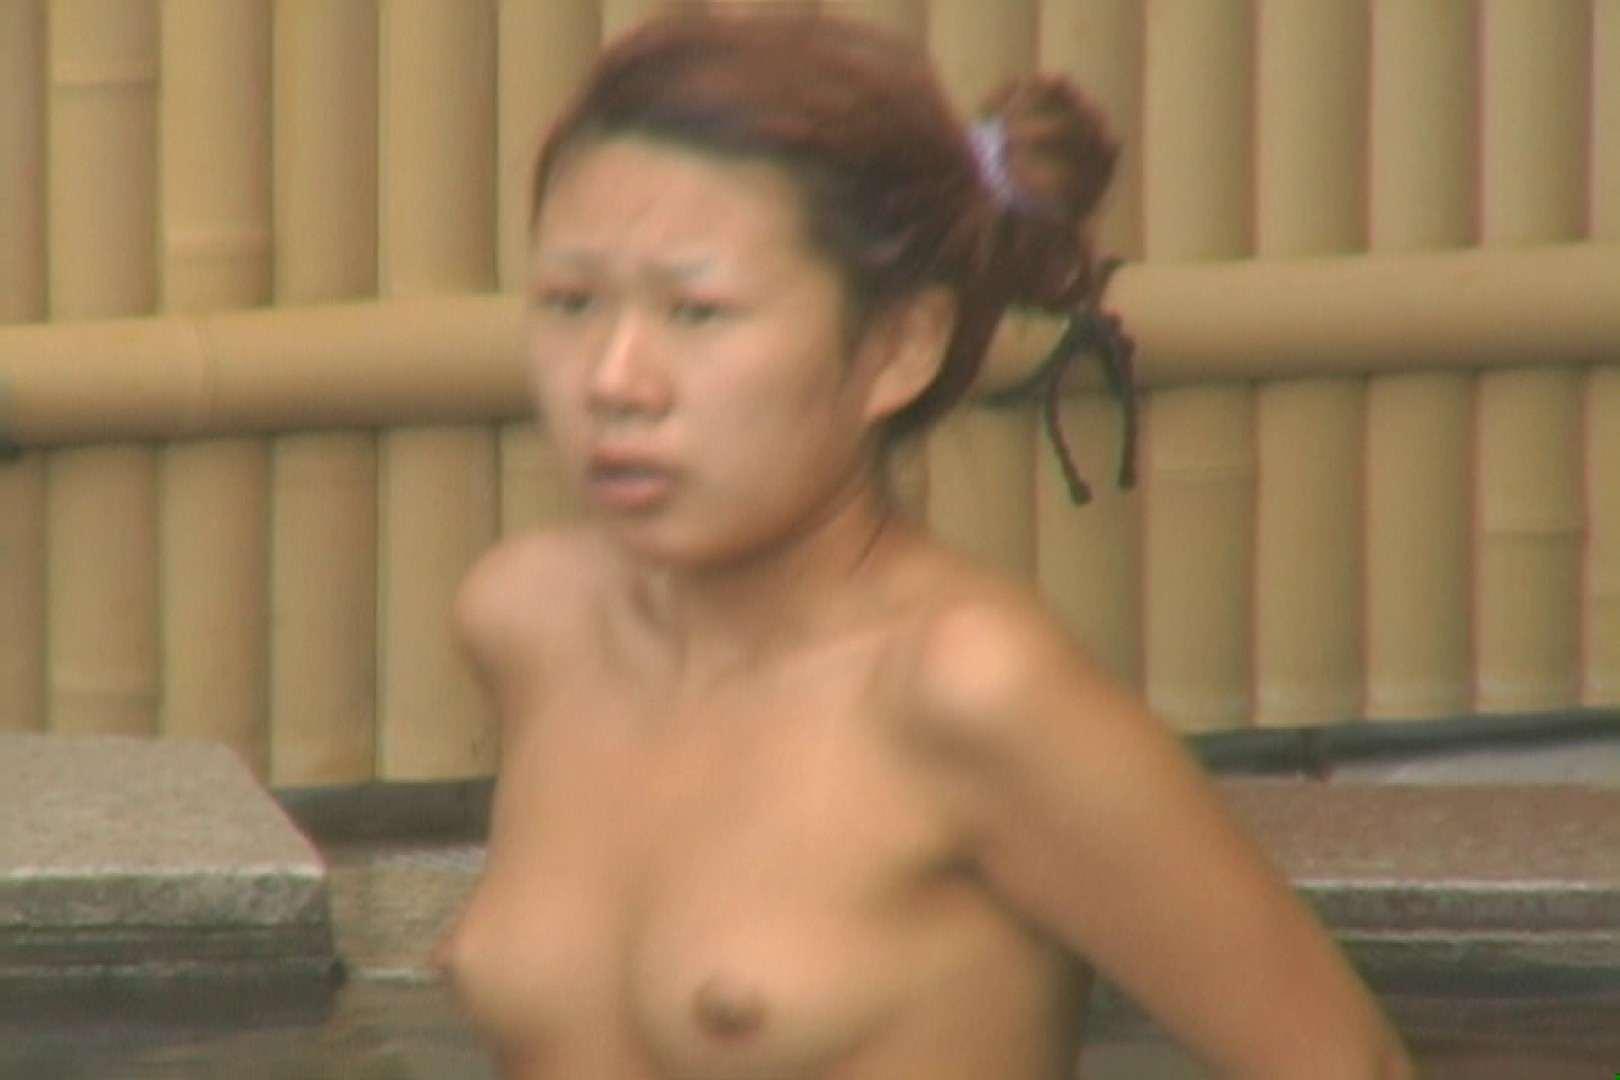 Aquaな露天風呂Vol.581 盗撮特撮 | 露天  12pic 4